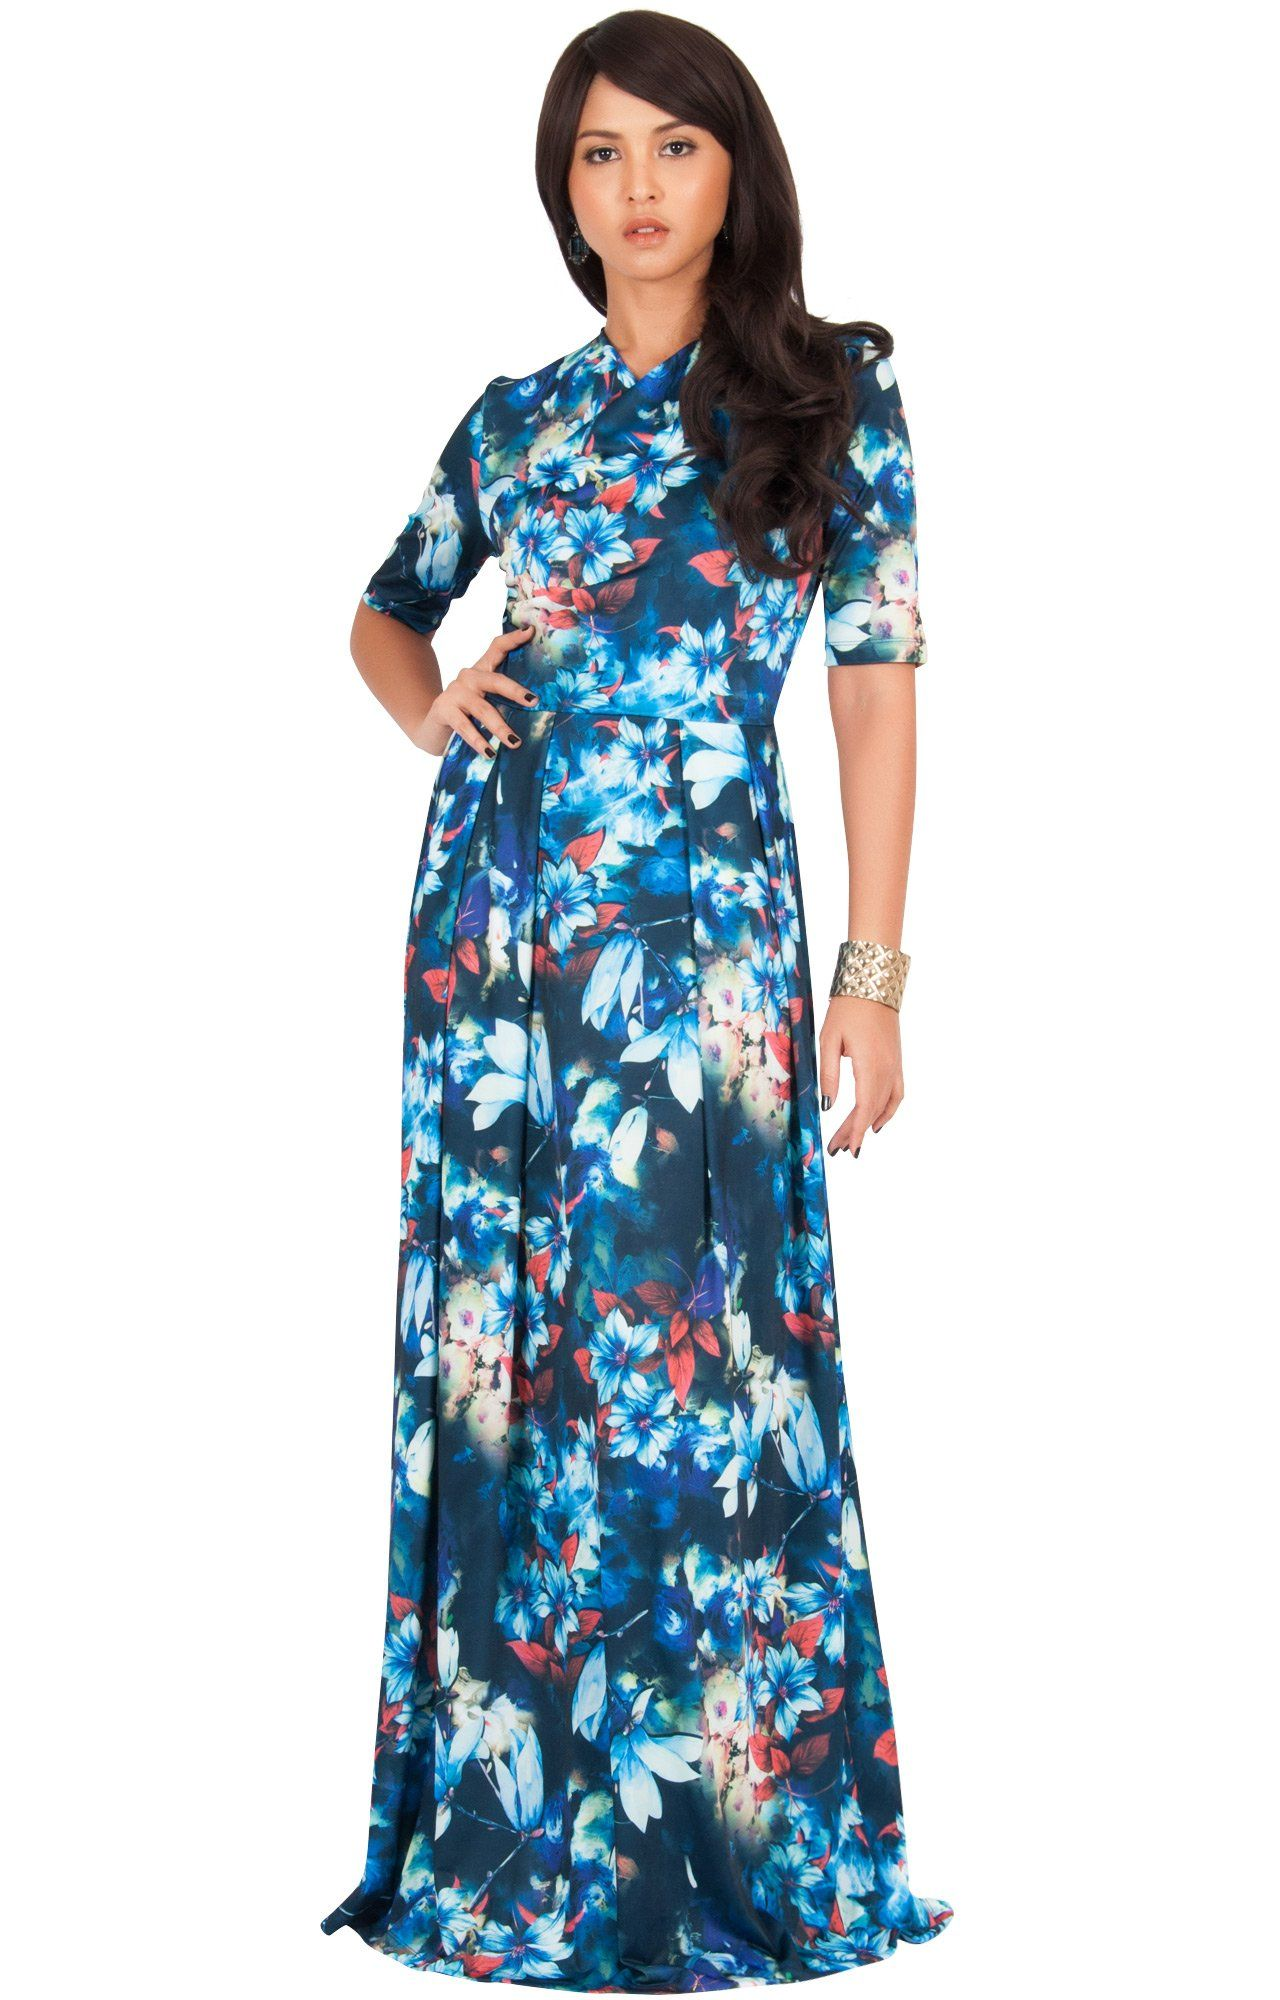 Maternity Outfits - smart maternity dresses : KOH KOH Plus ...